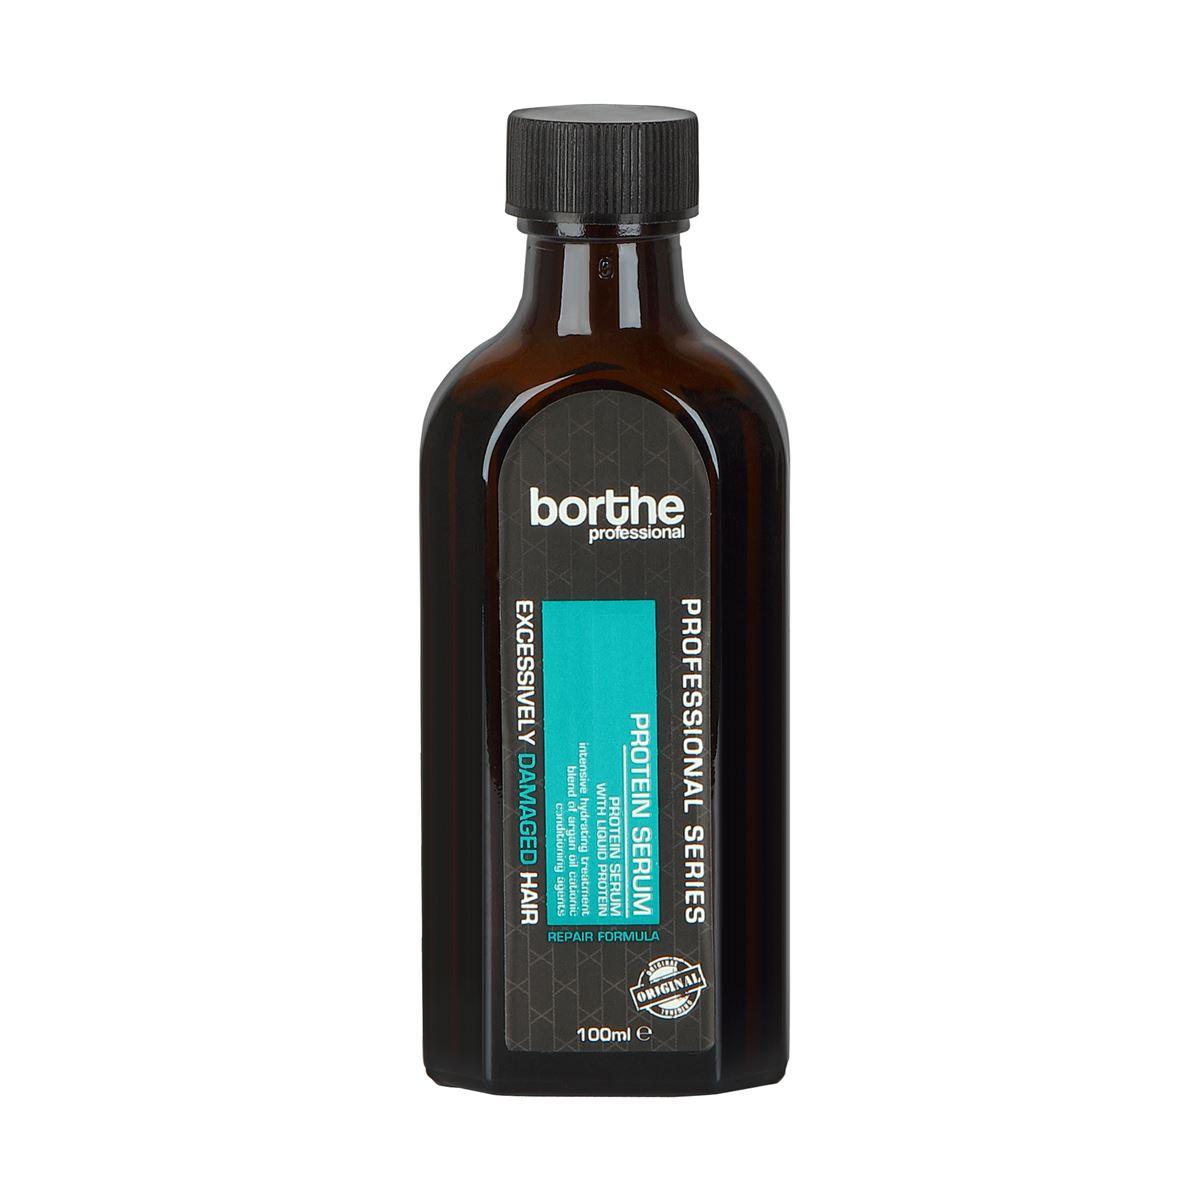 Borthe Saç Serumu Protein 100 ml.